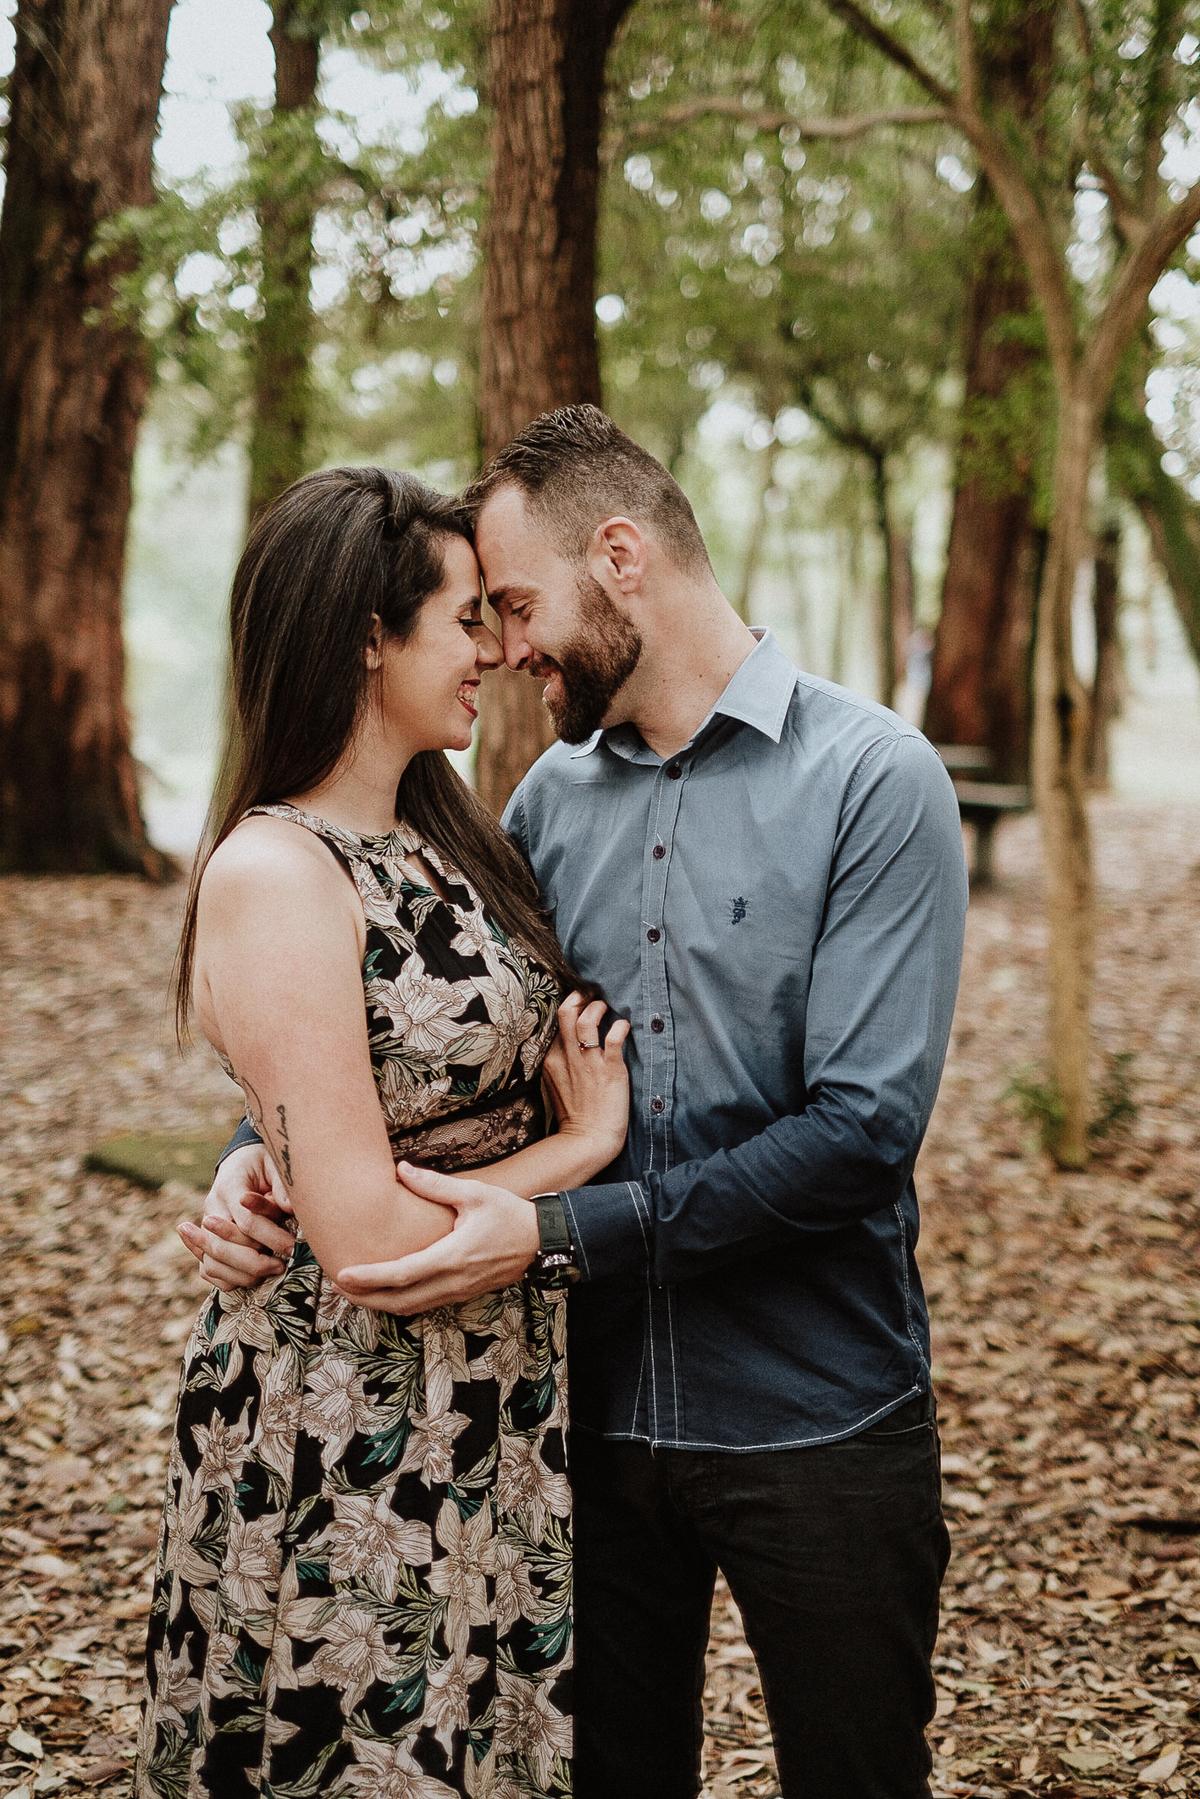 ensaio pre casamento ensaio no campo fotografos de casamento em sao paulo noivos sorrindo ibirapuera pre wedding no ibirapuera